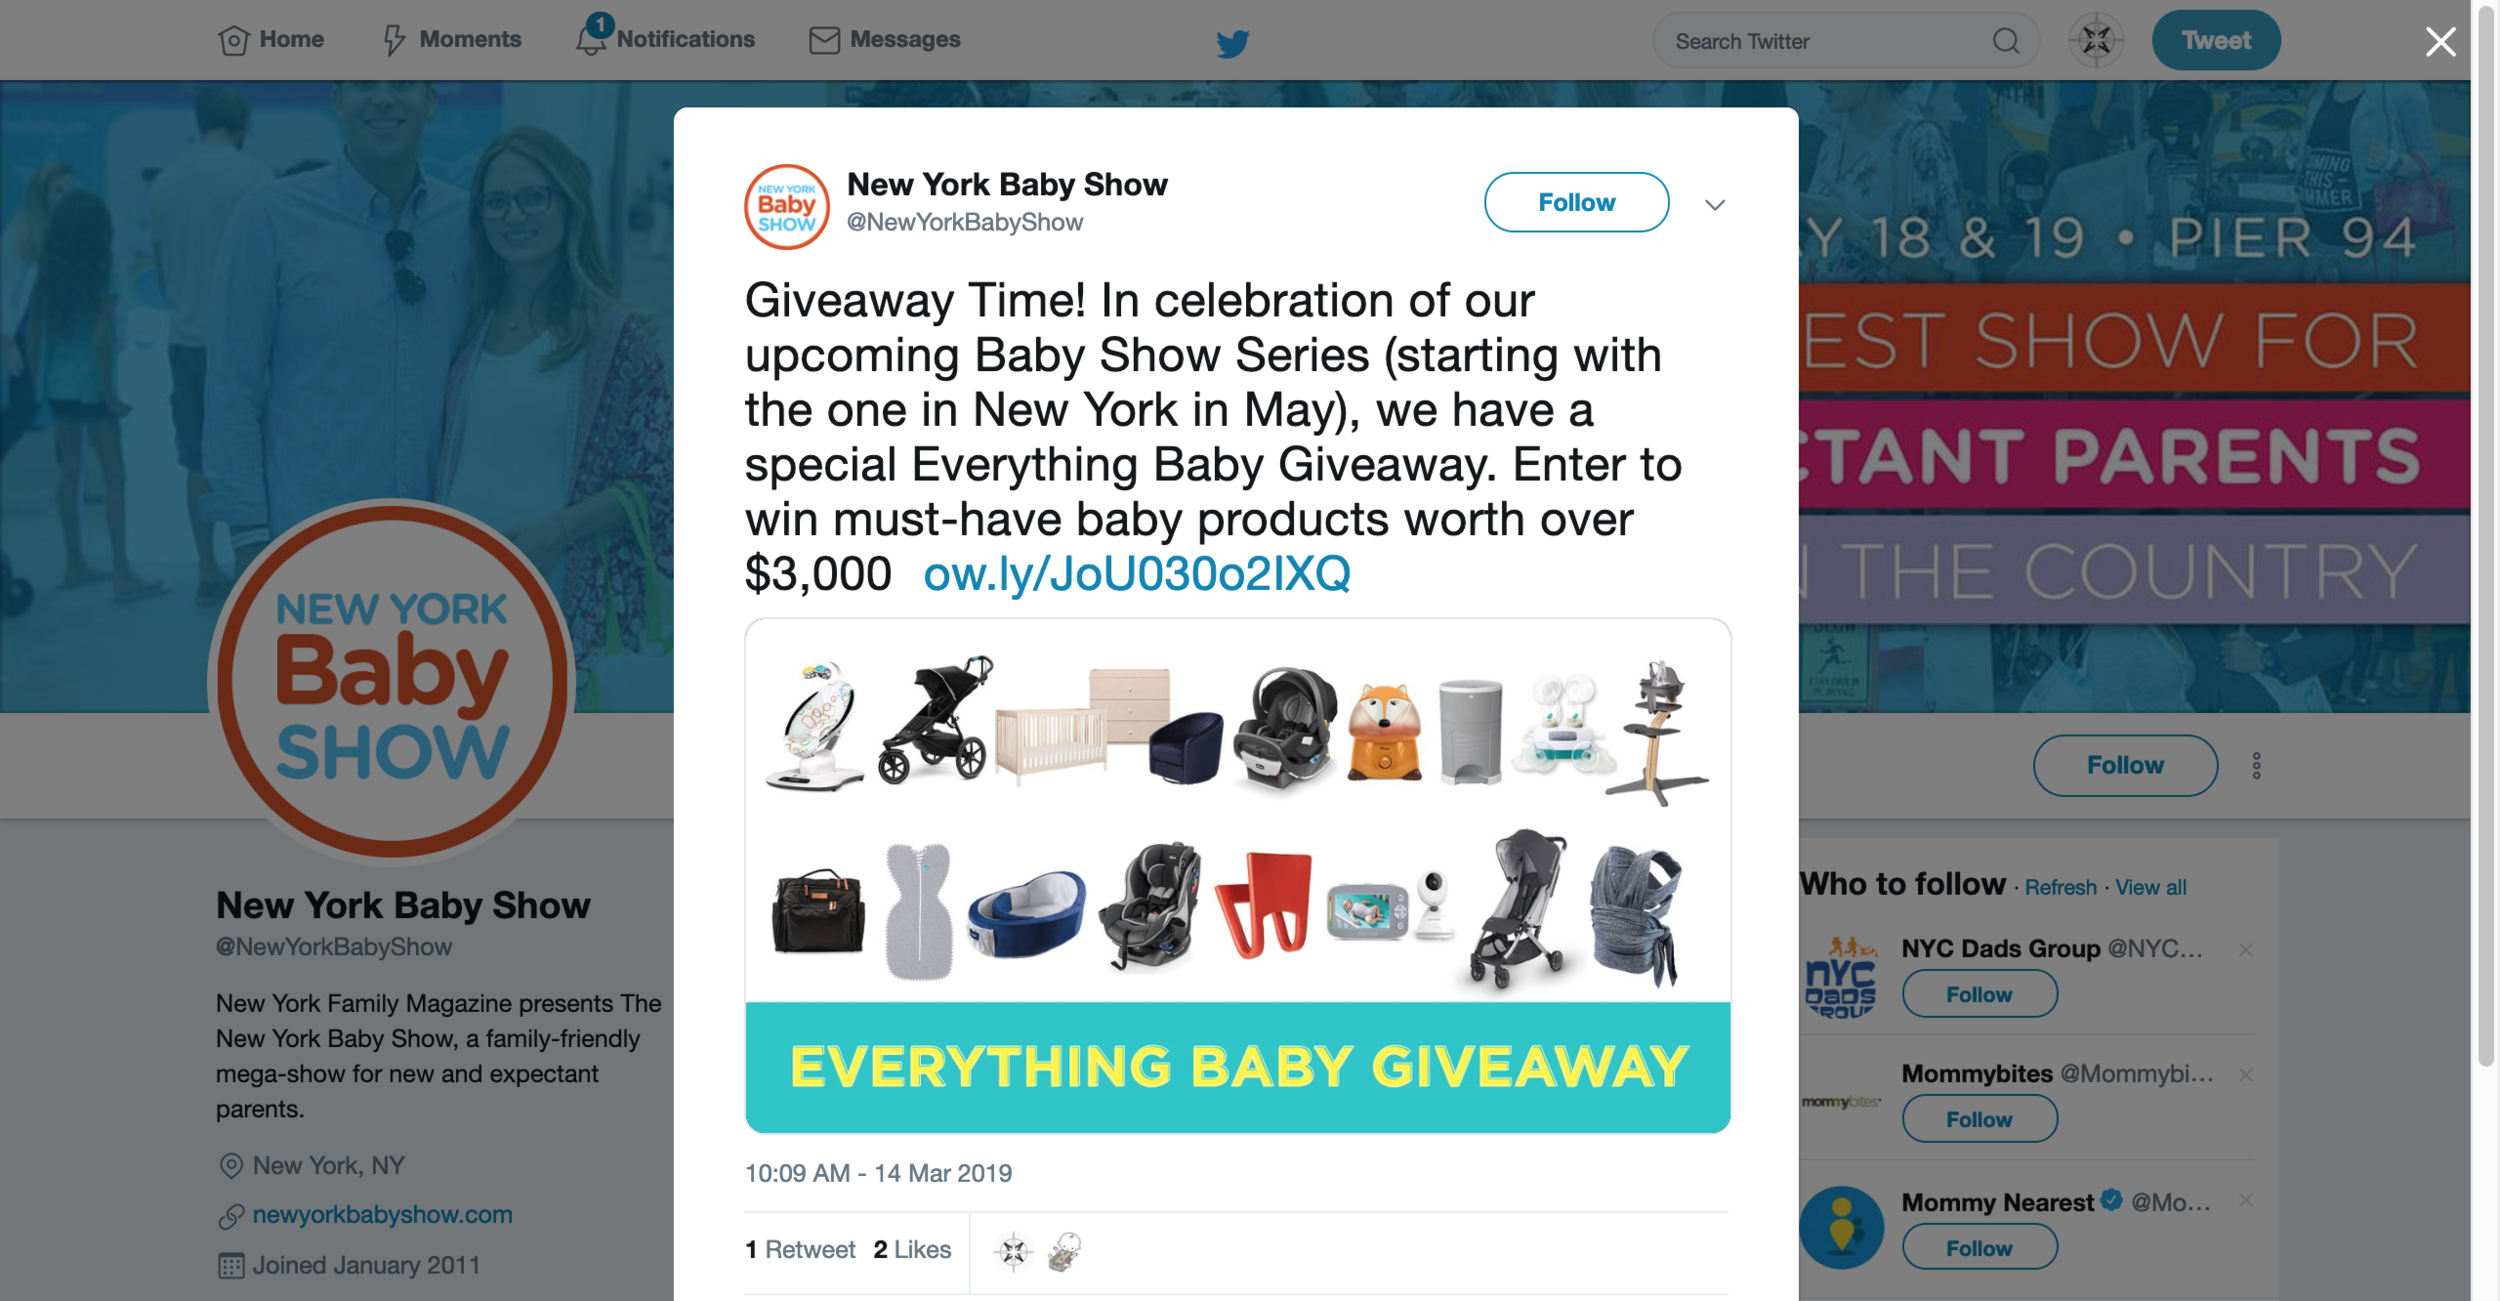 2019.03.14_(New York Family Online) newyorkbabyshow.com, Twitter_Summer Baby Pixel Cadet.png